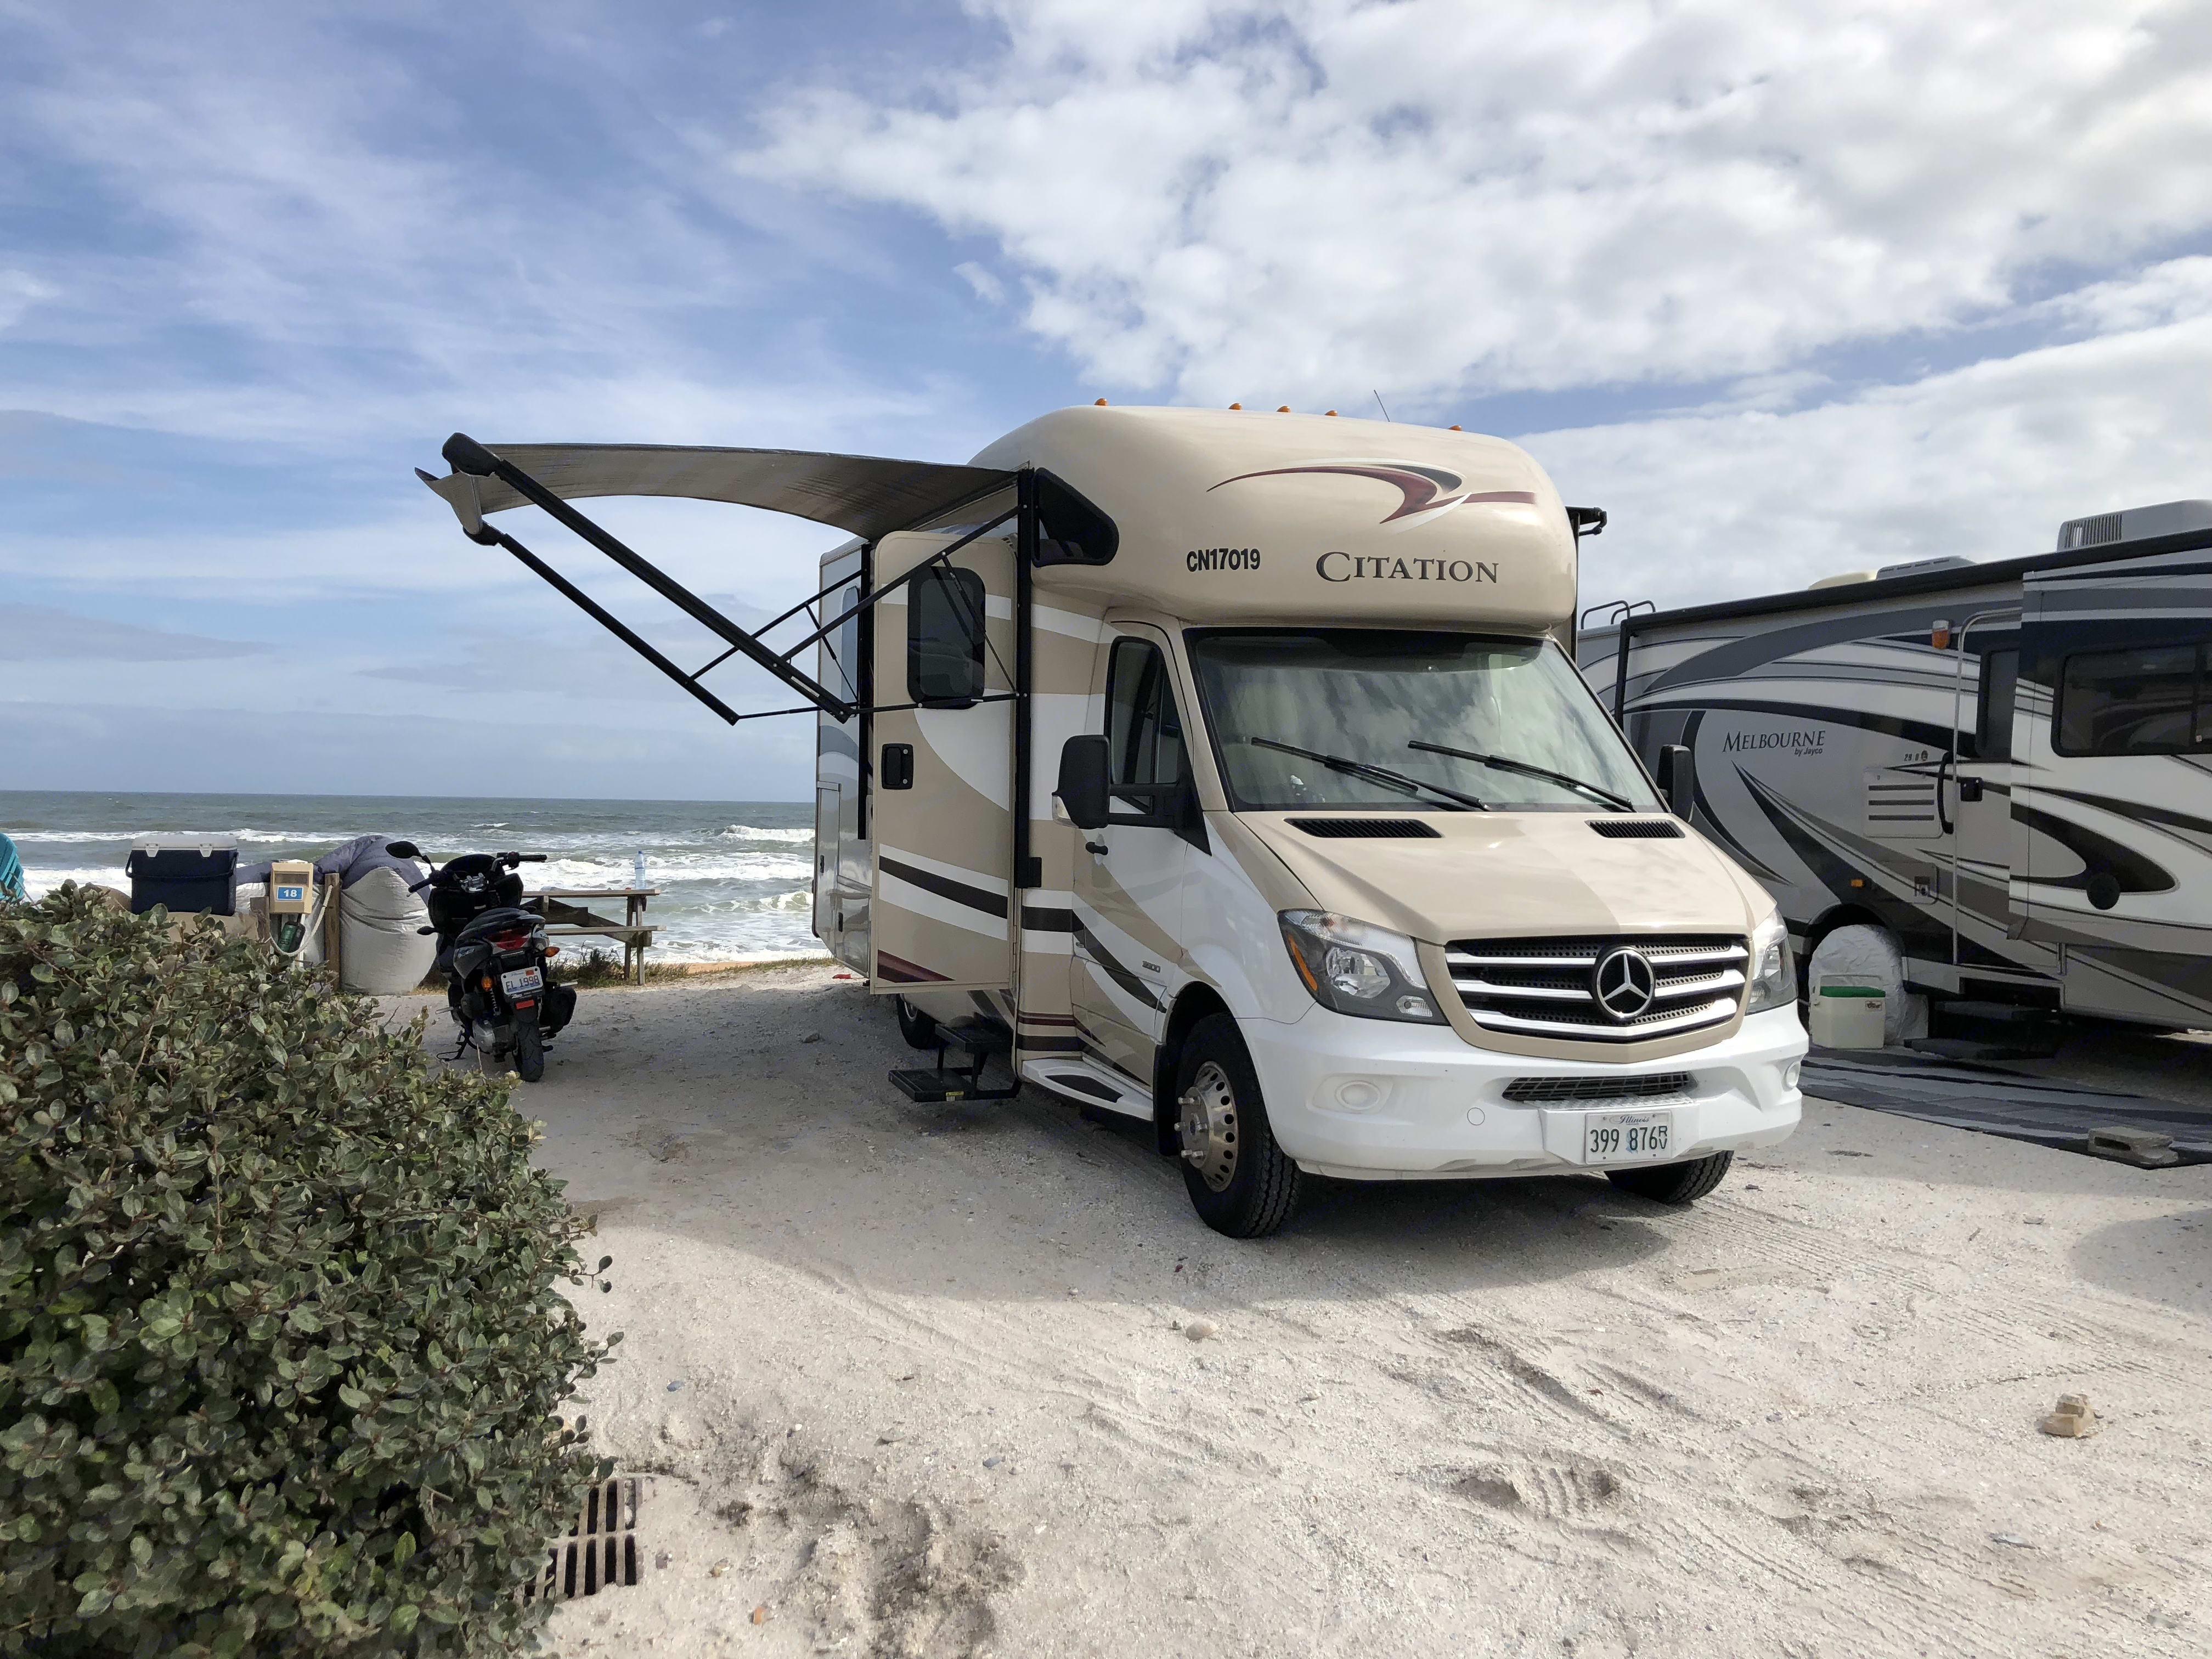 Thor Motor Coach Chateau Citation Sprinter 2017